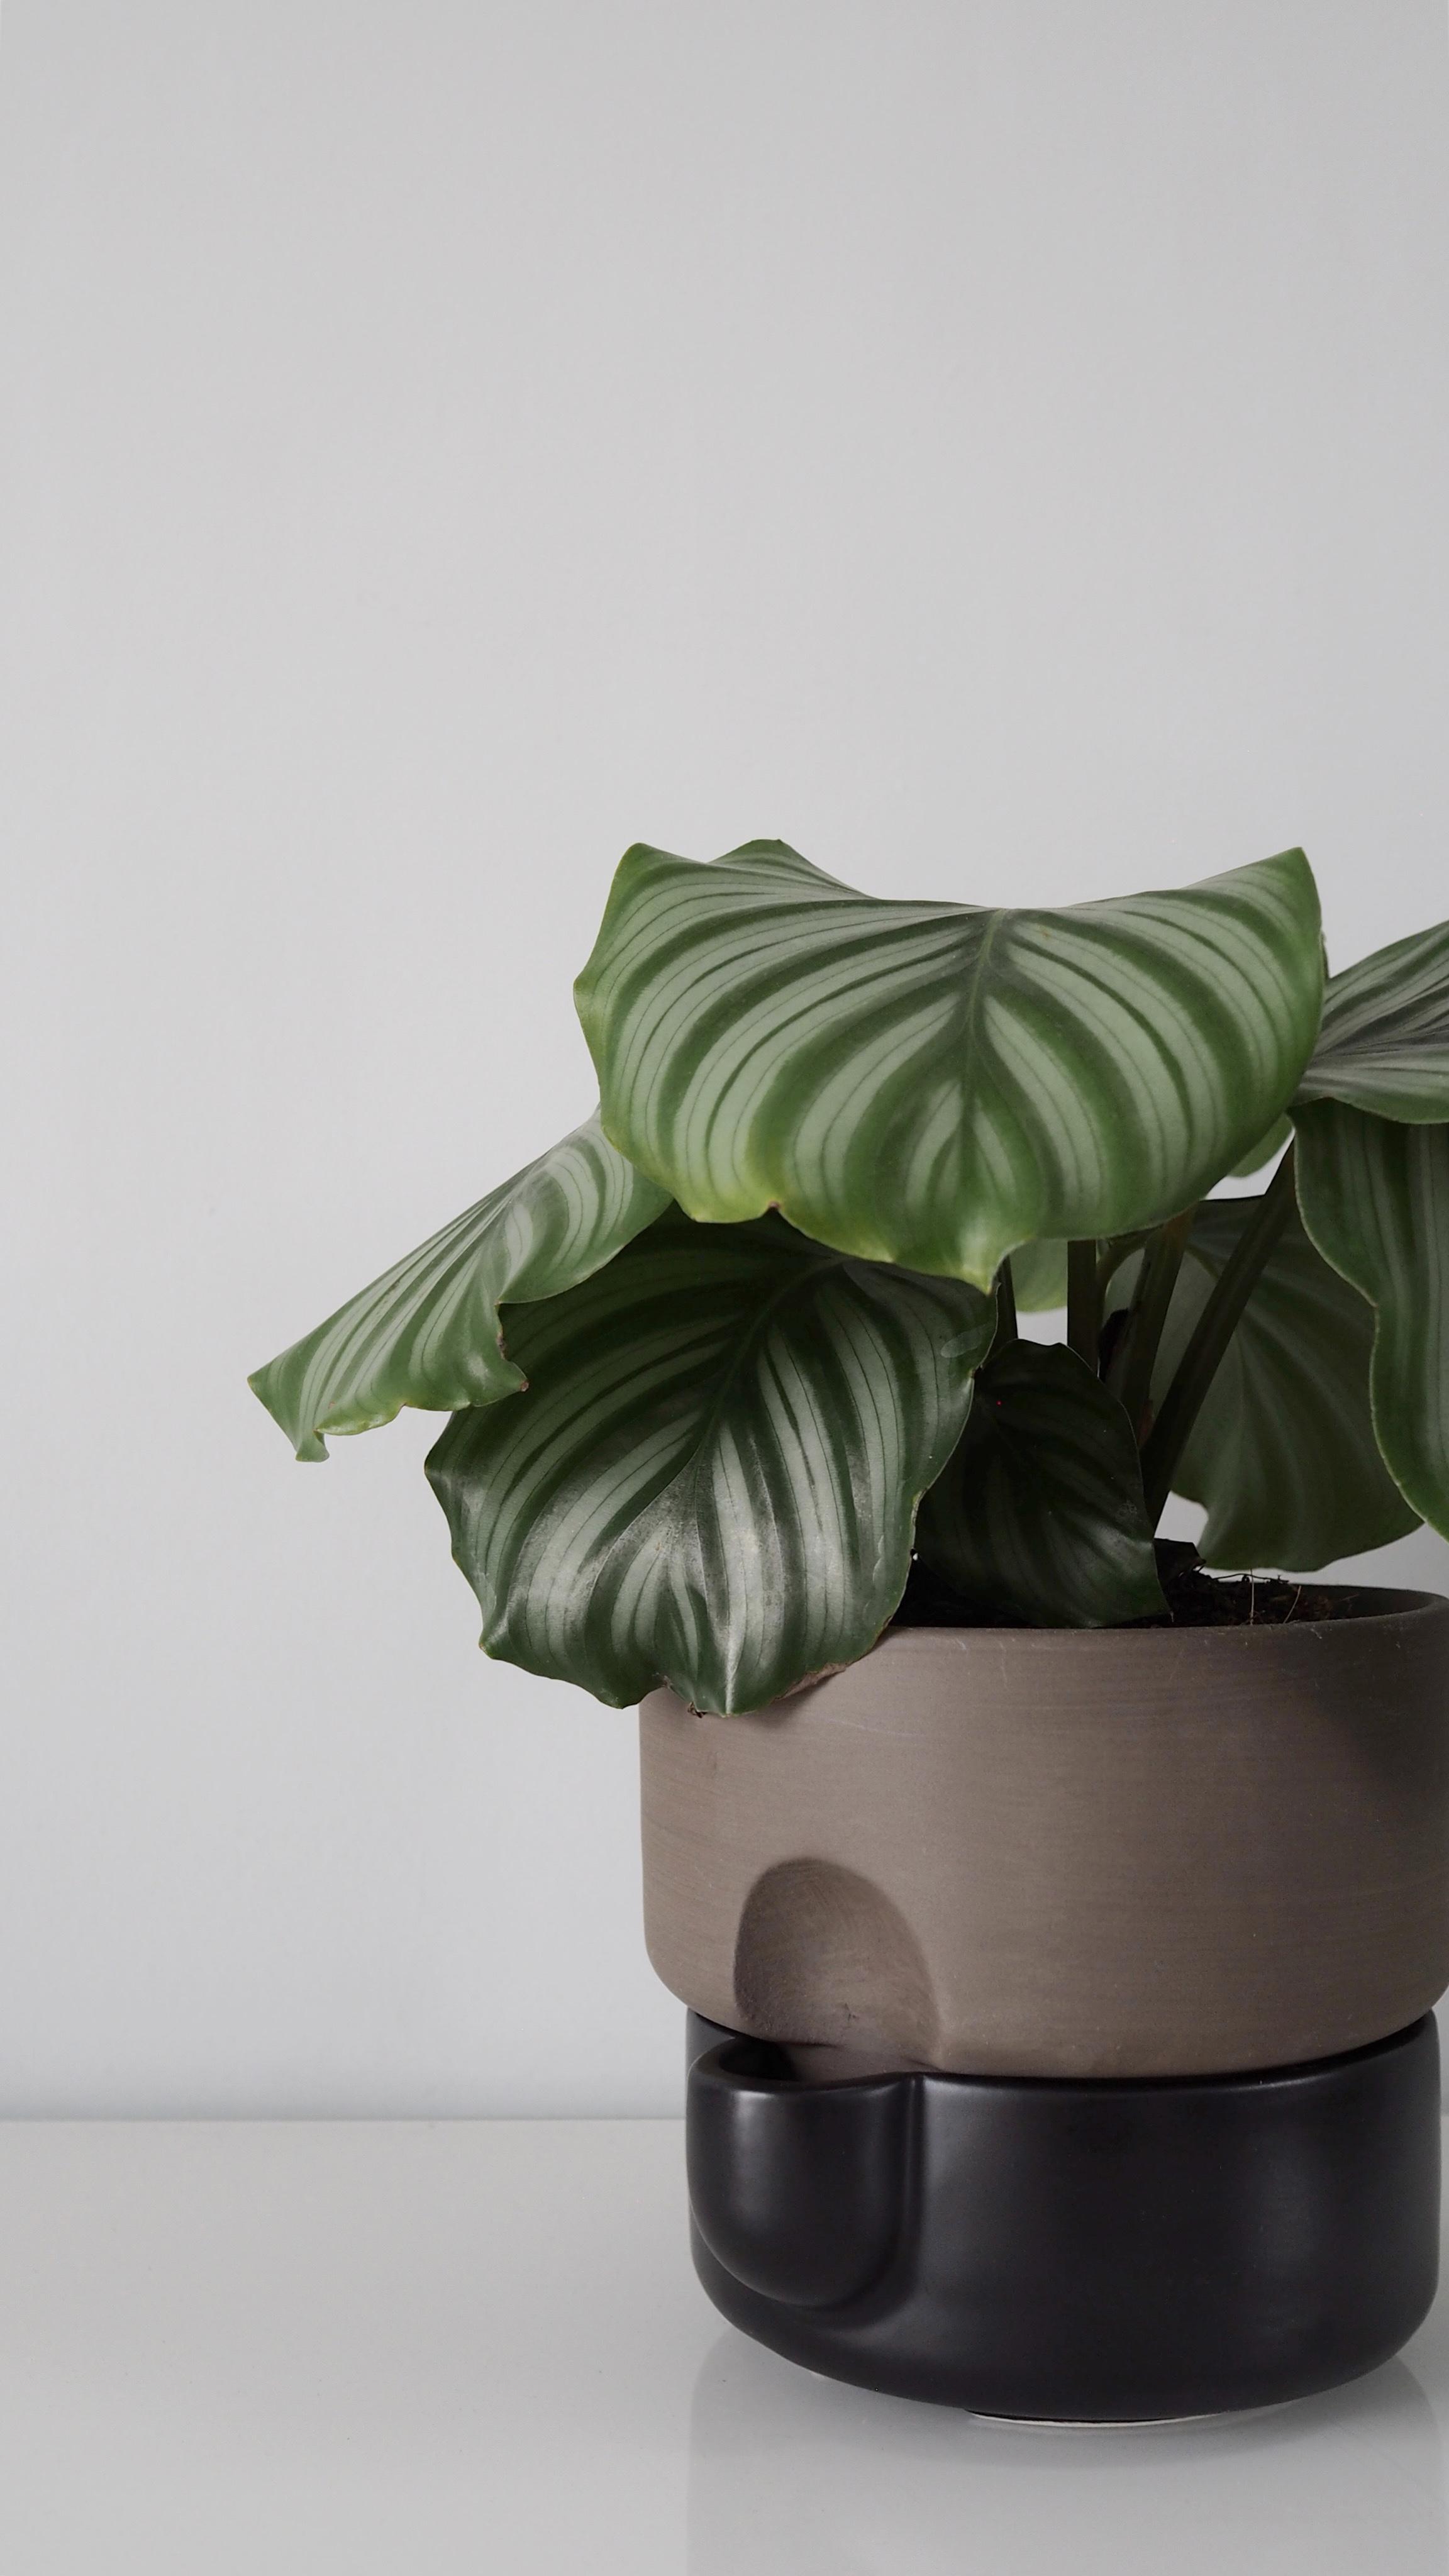 Northern_Oasis_self-watering_flowerpot_window_3_Holiday_Care_for_Houseplants_Nicola_Capper.jpg